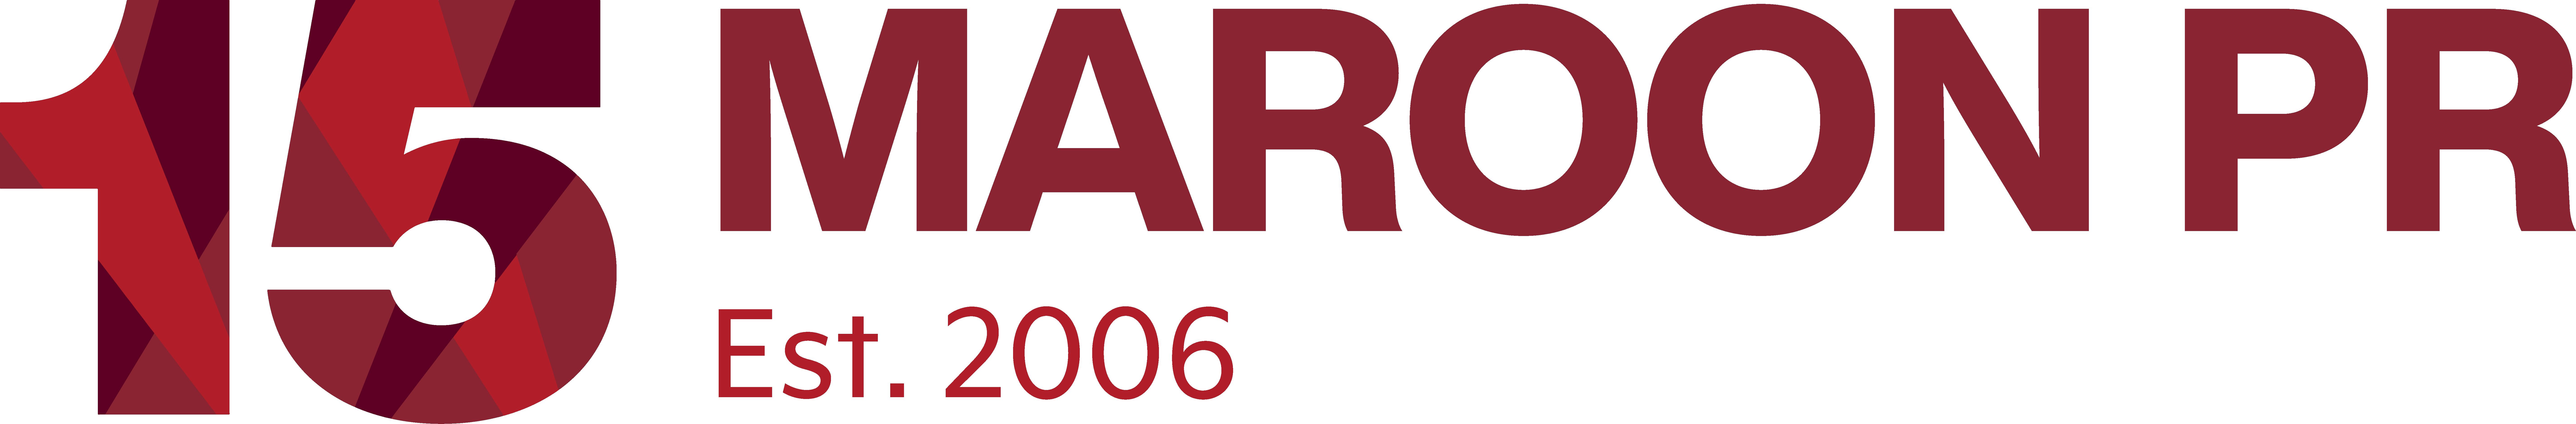 Maroon PR